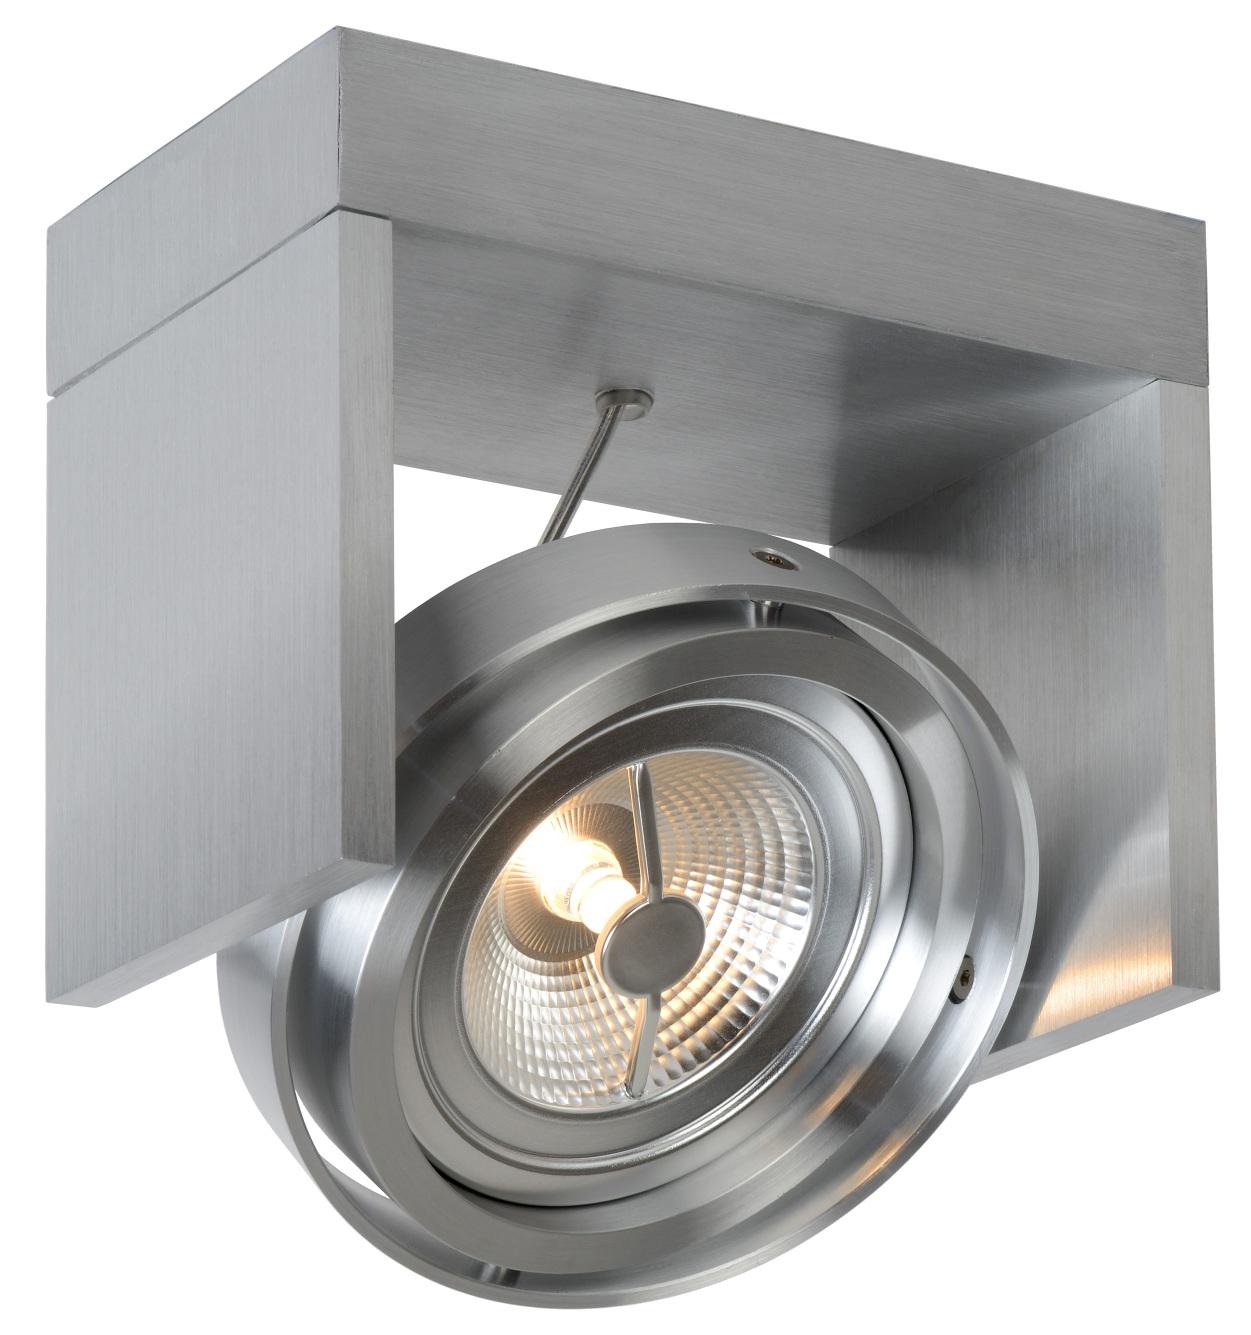 Lucide Plafondspot Zett 1 - Dimbare LED - Aluminium